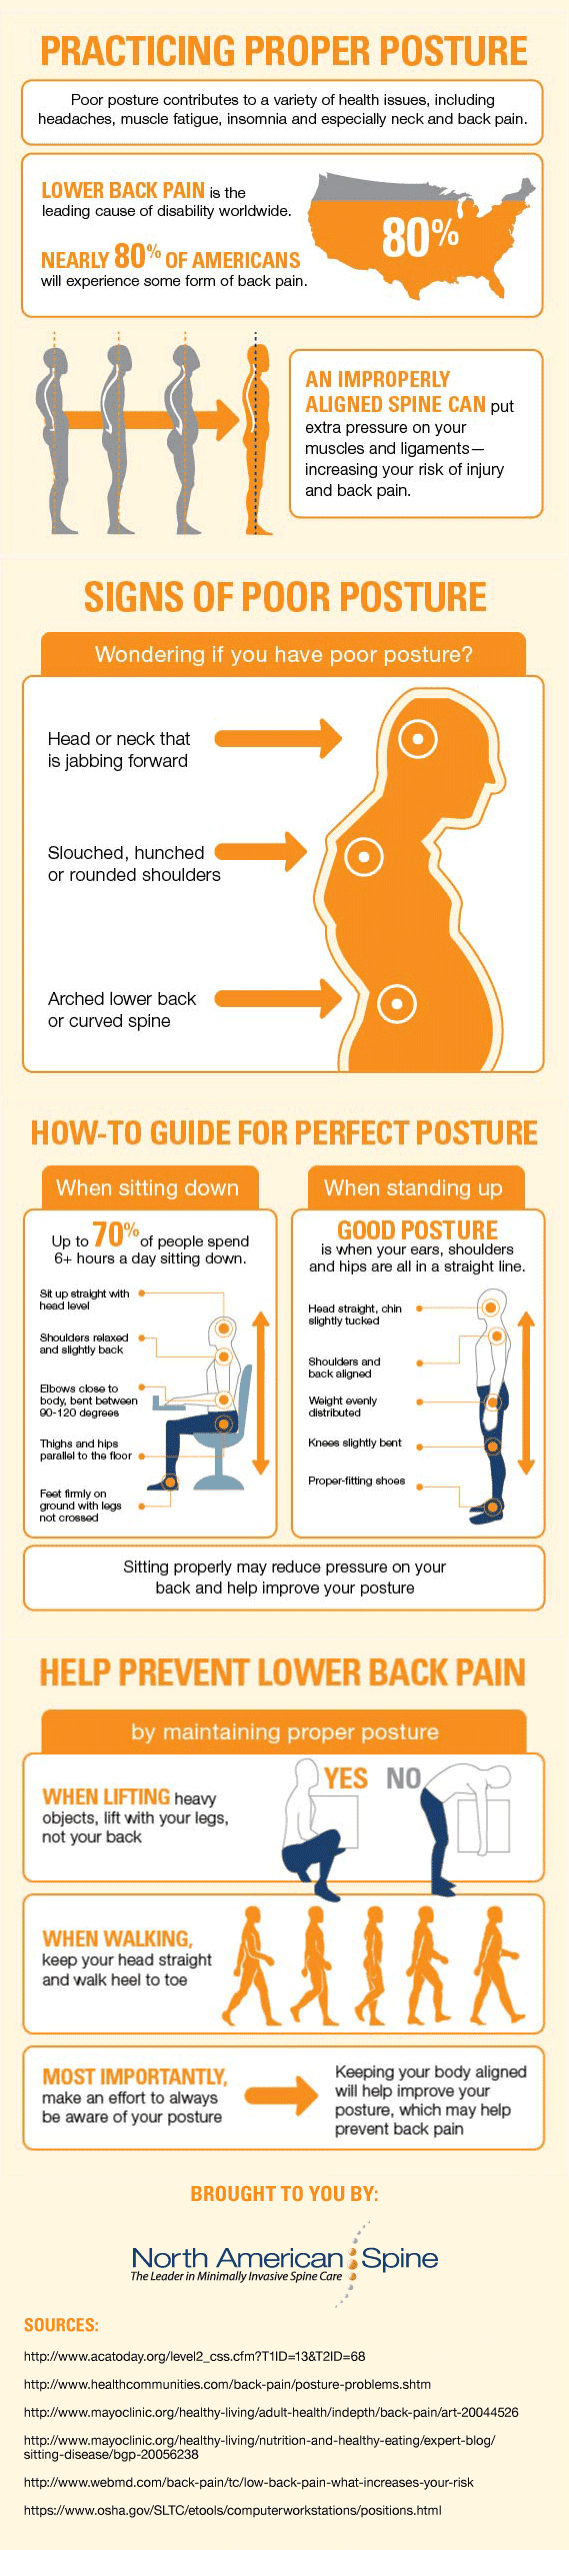 Infographic: Practicing Proper Posture